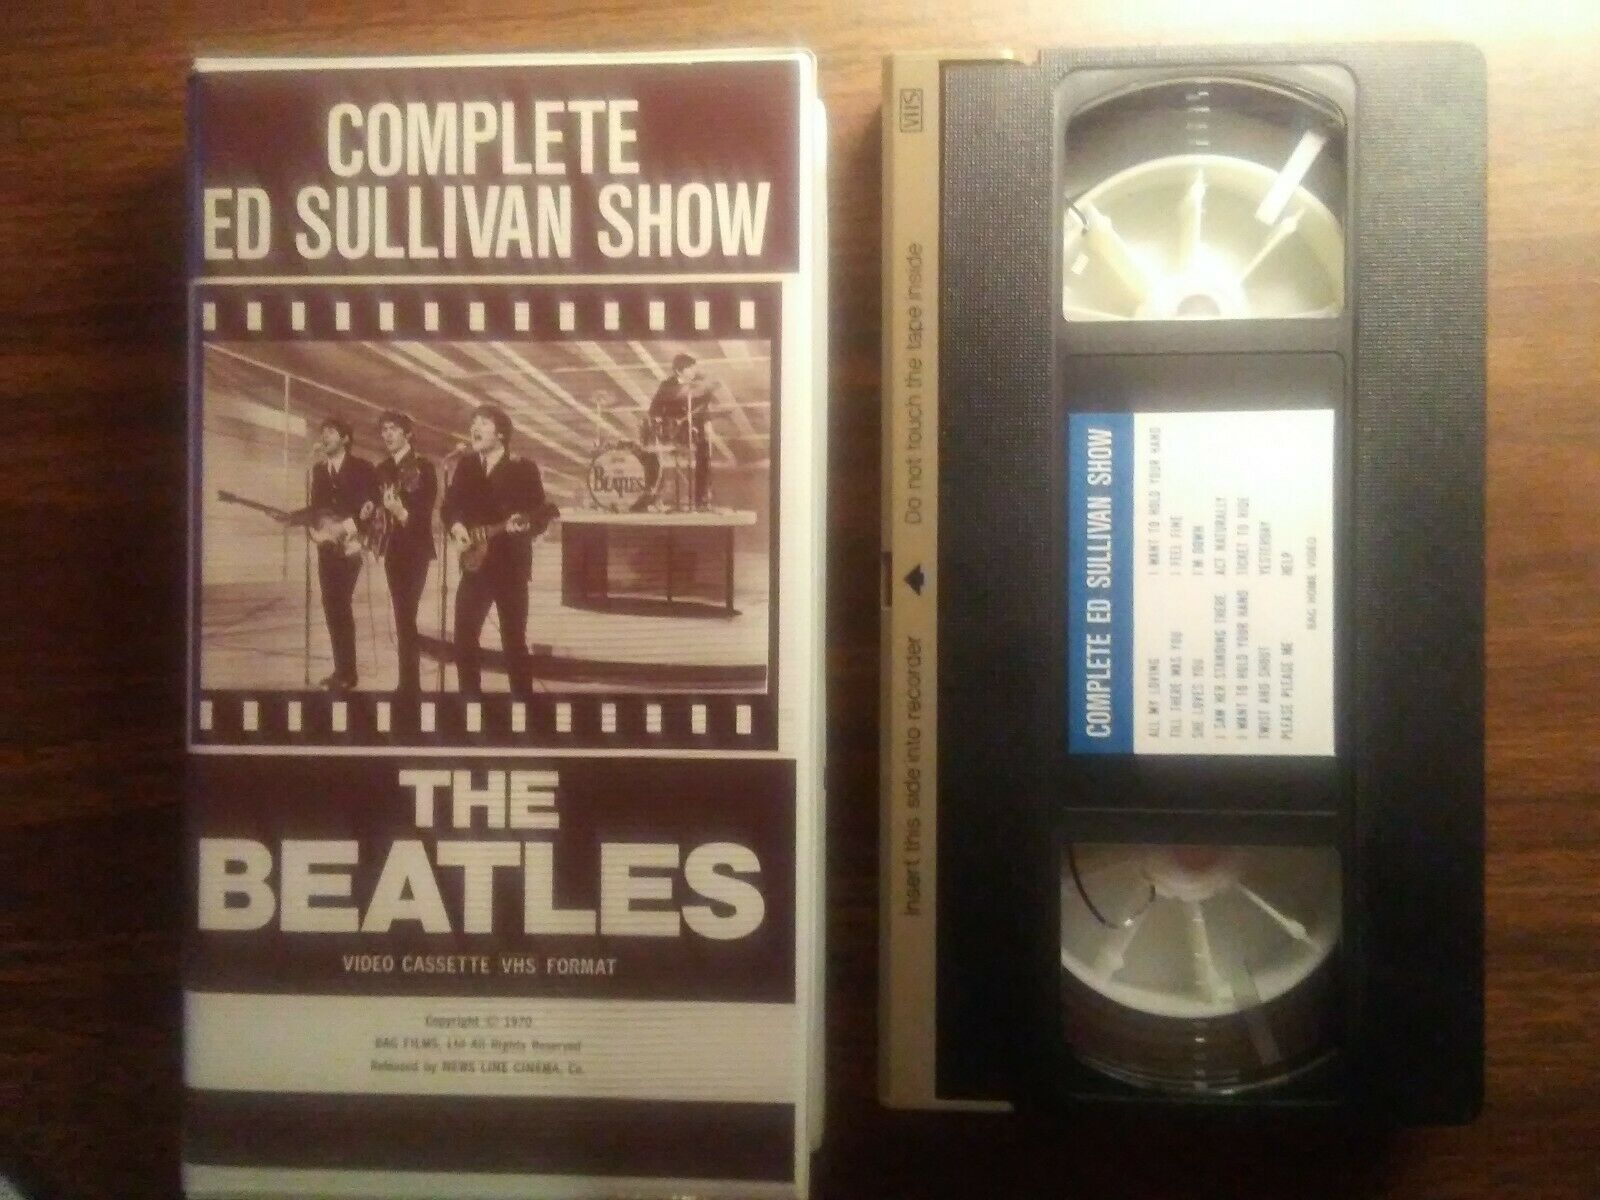 THE BEATLES VHS Rare Complete Ed Sullivan Show Video Cassette Format 1970 - $25.00